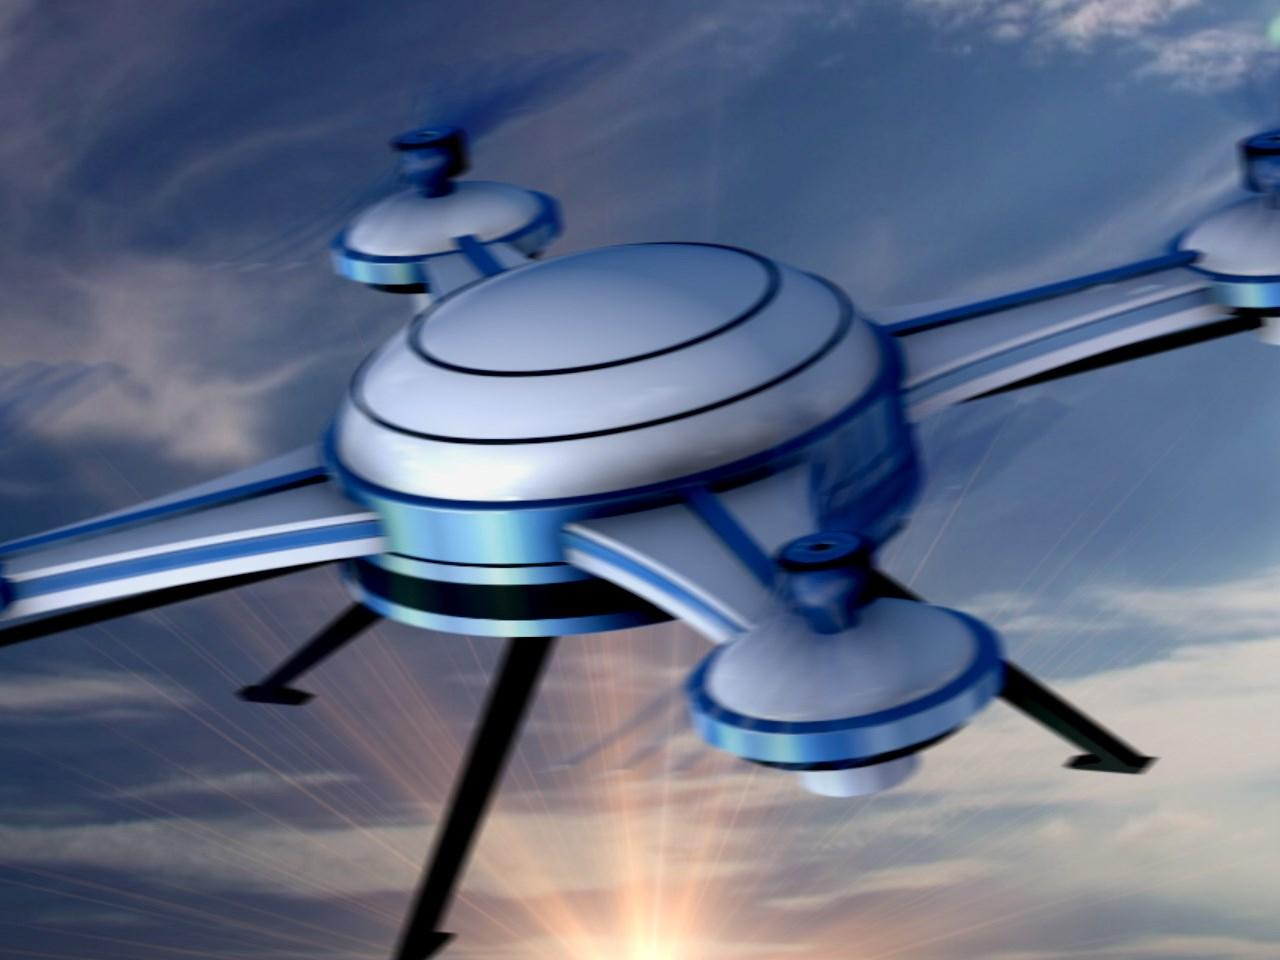 Drone__1_1556061529181.jpg